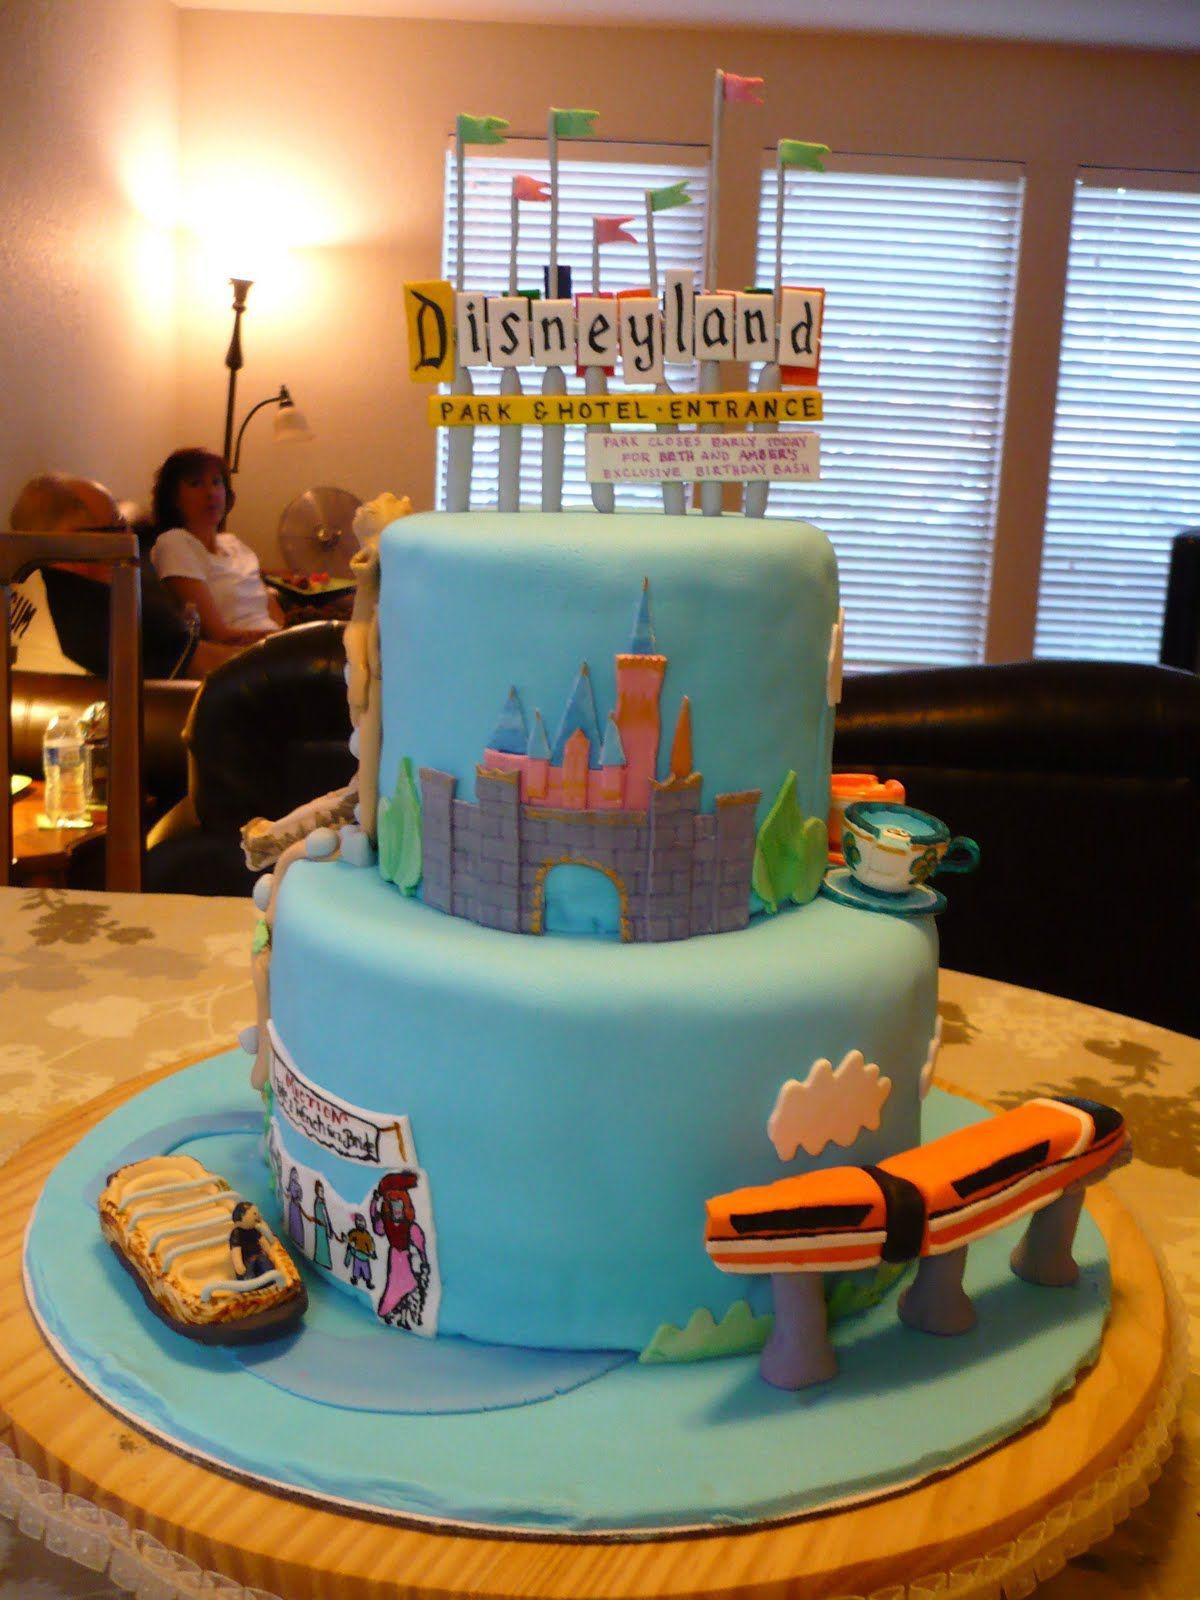 The Wright Report DISNEYLAND CAKE! Disney cakes